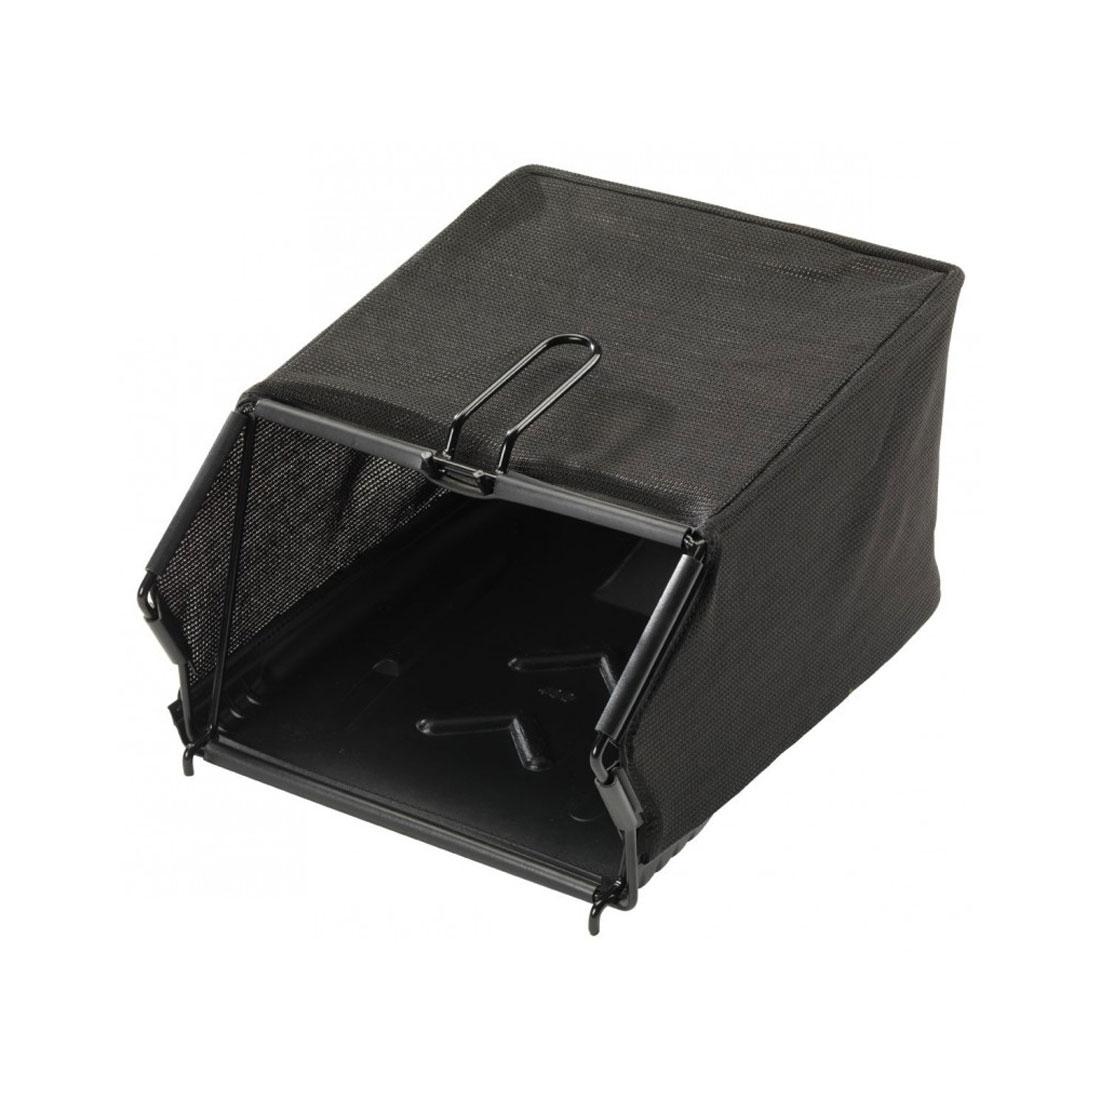 Collection basket for Eurosystem aerator